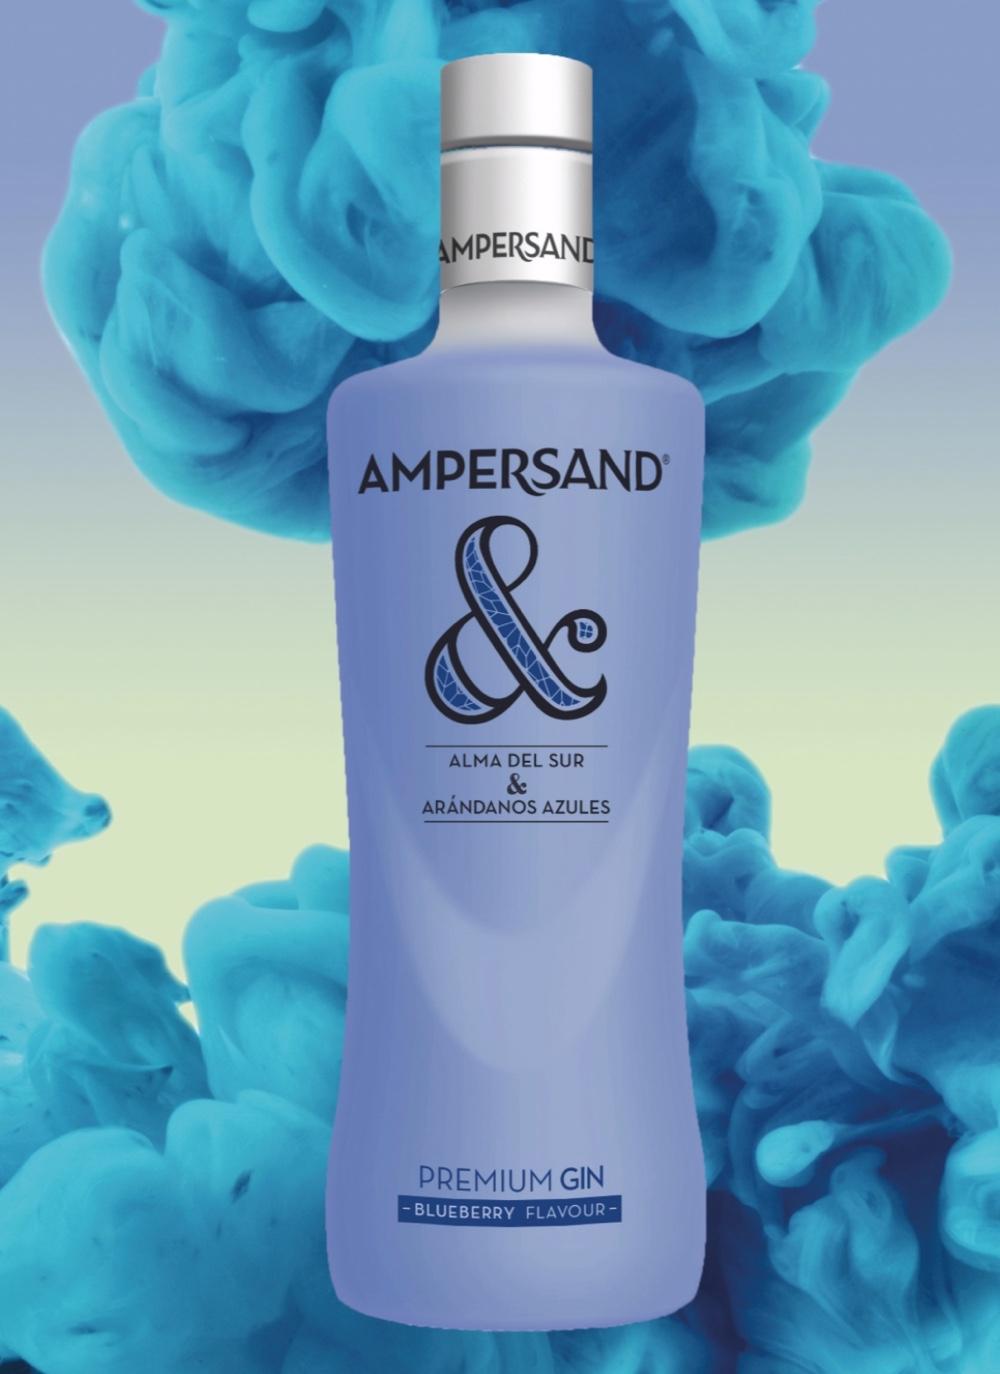 Ampersand Arándanos Azules